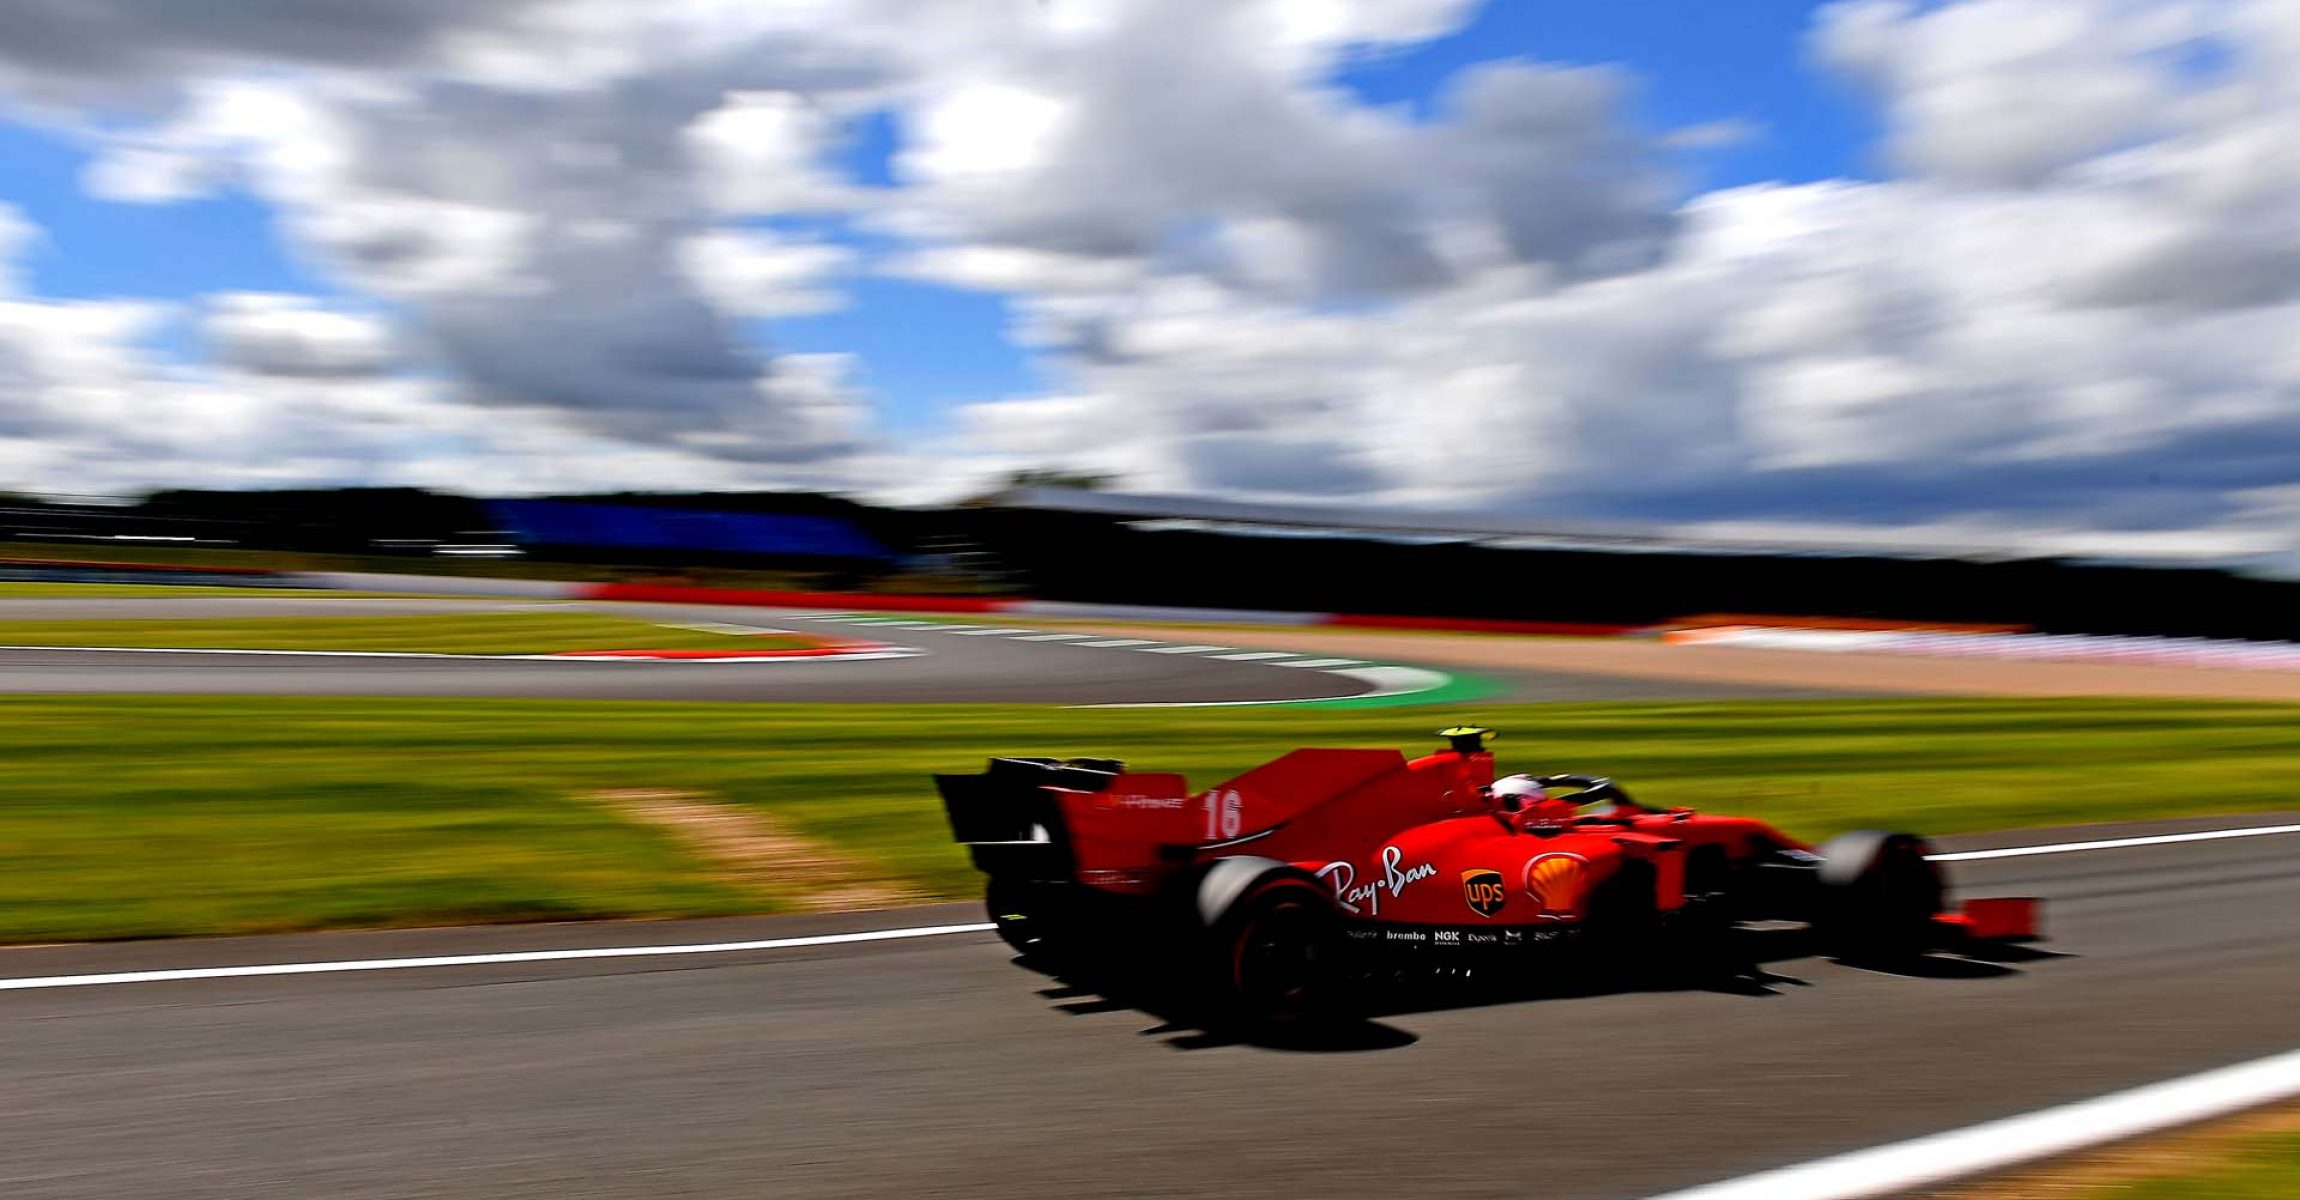 GP GRAN BRETAGNA F1/2020 - SABATO 01/08/2020 credit: @Scuderia Ferrari Press Office Charles Leclerc